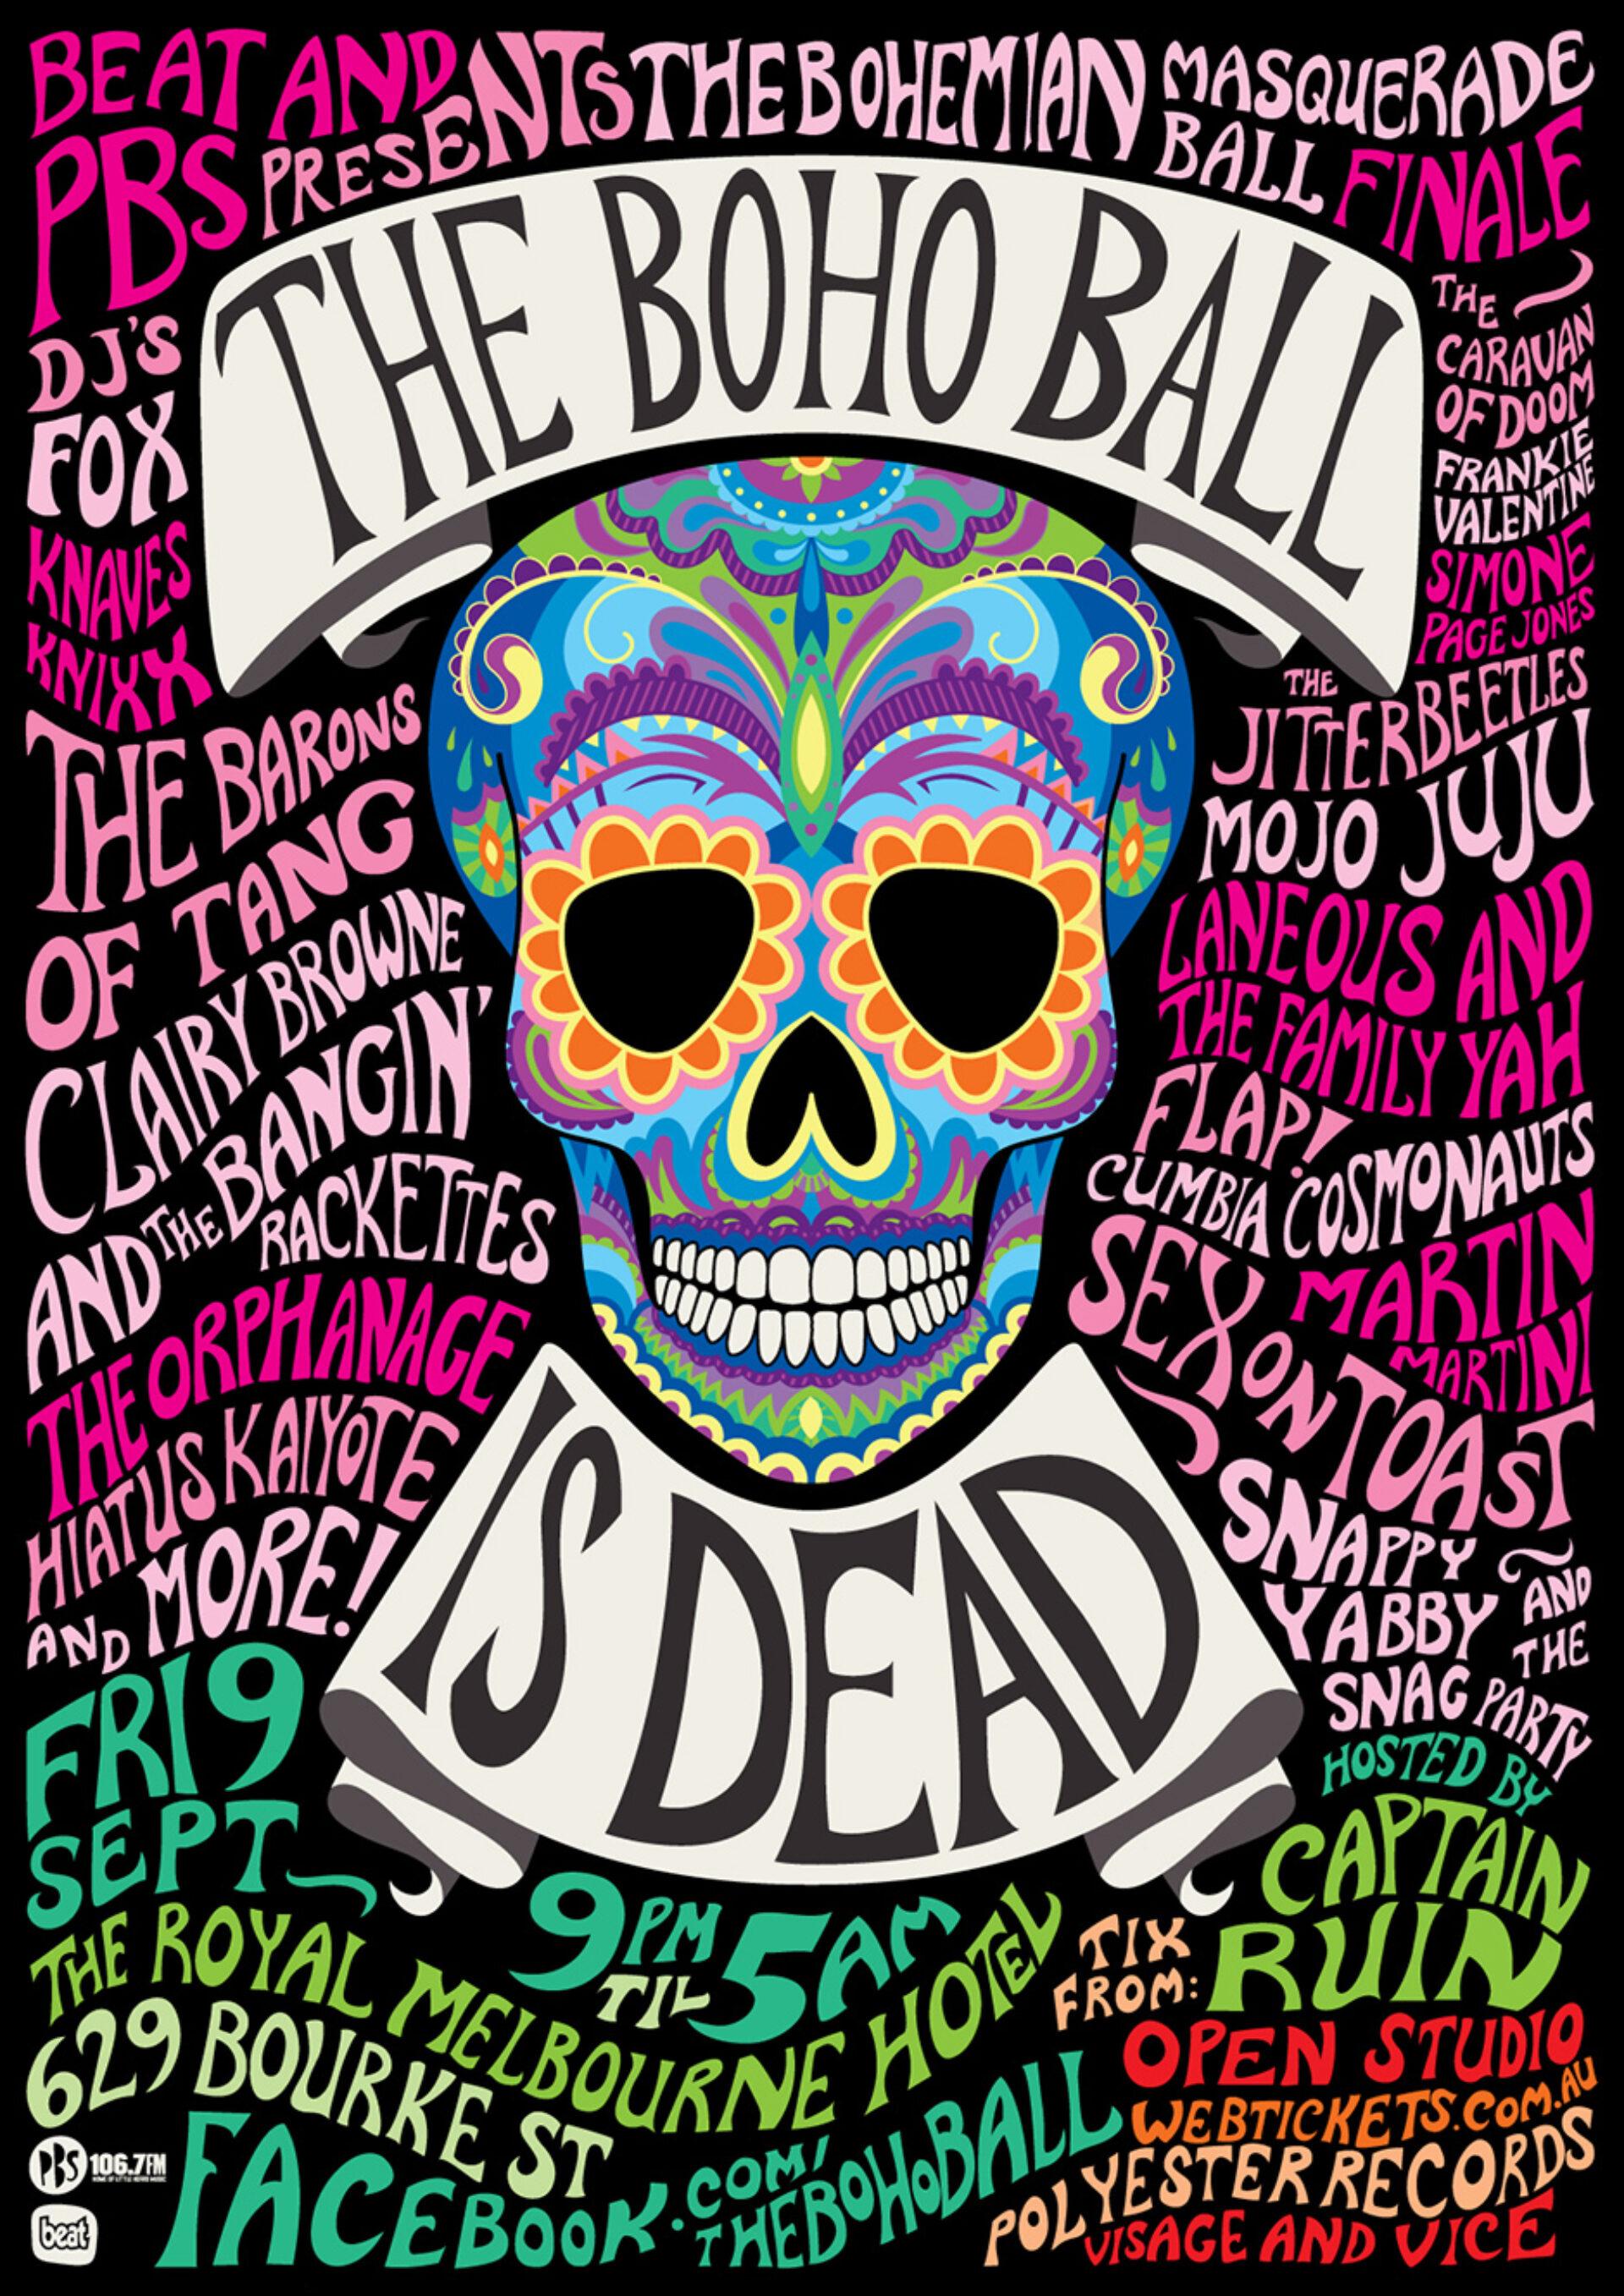 Headjam Boho Ball020